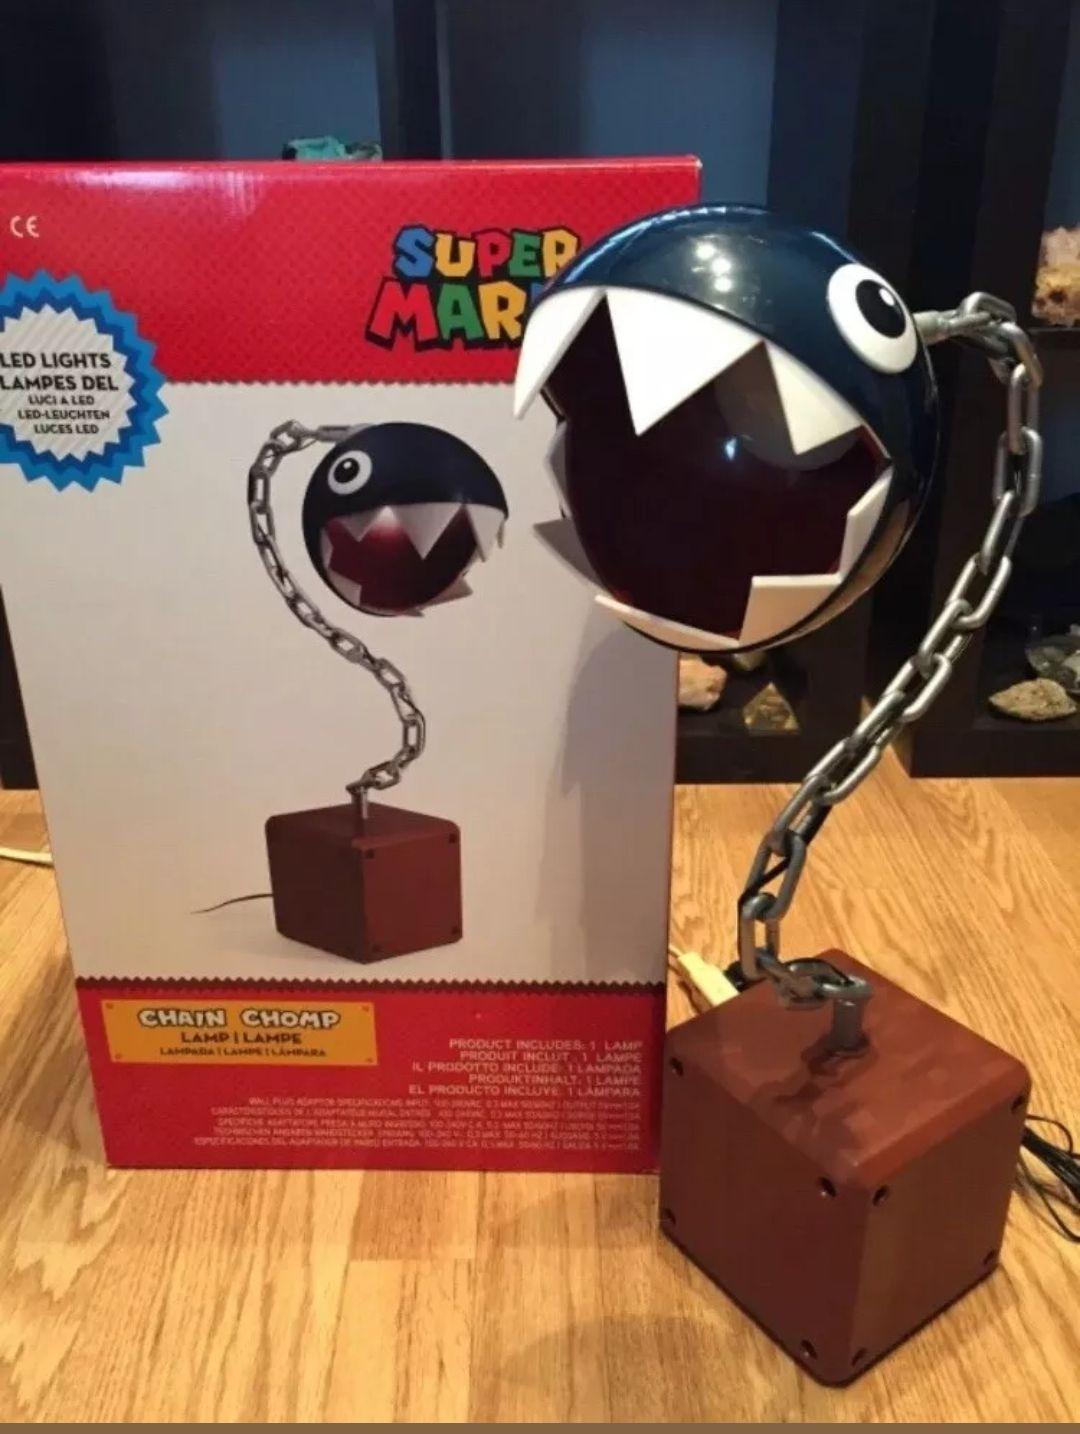 Mario chain chomp lamp £50 instore @ Game Westfield Sheppards Bush